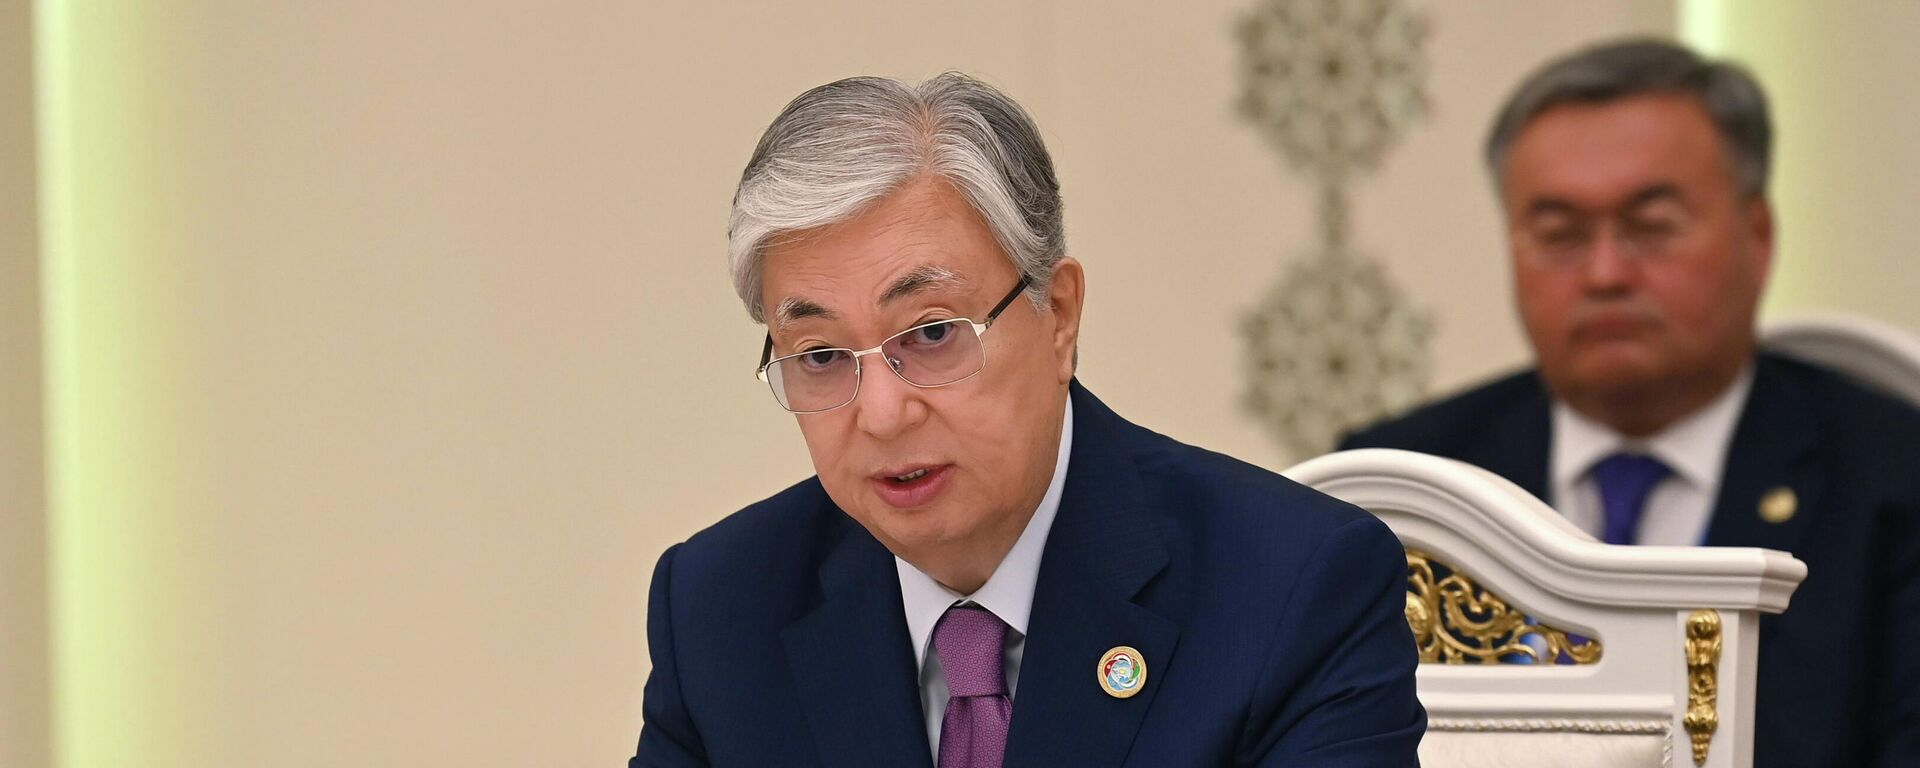 Президент Казахстана Касым-Жомарт Токаев - Sputnik Таджикистан, 1920, 17.09.2021